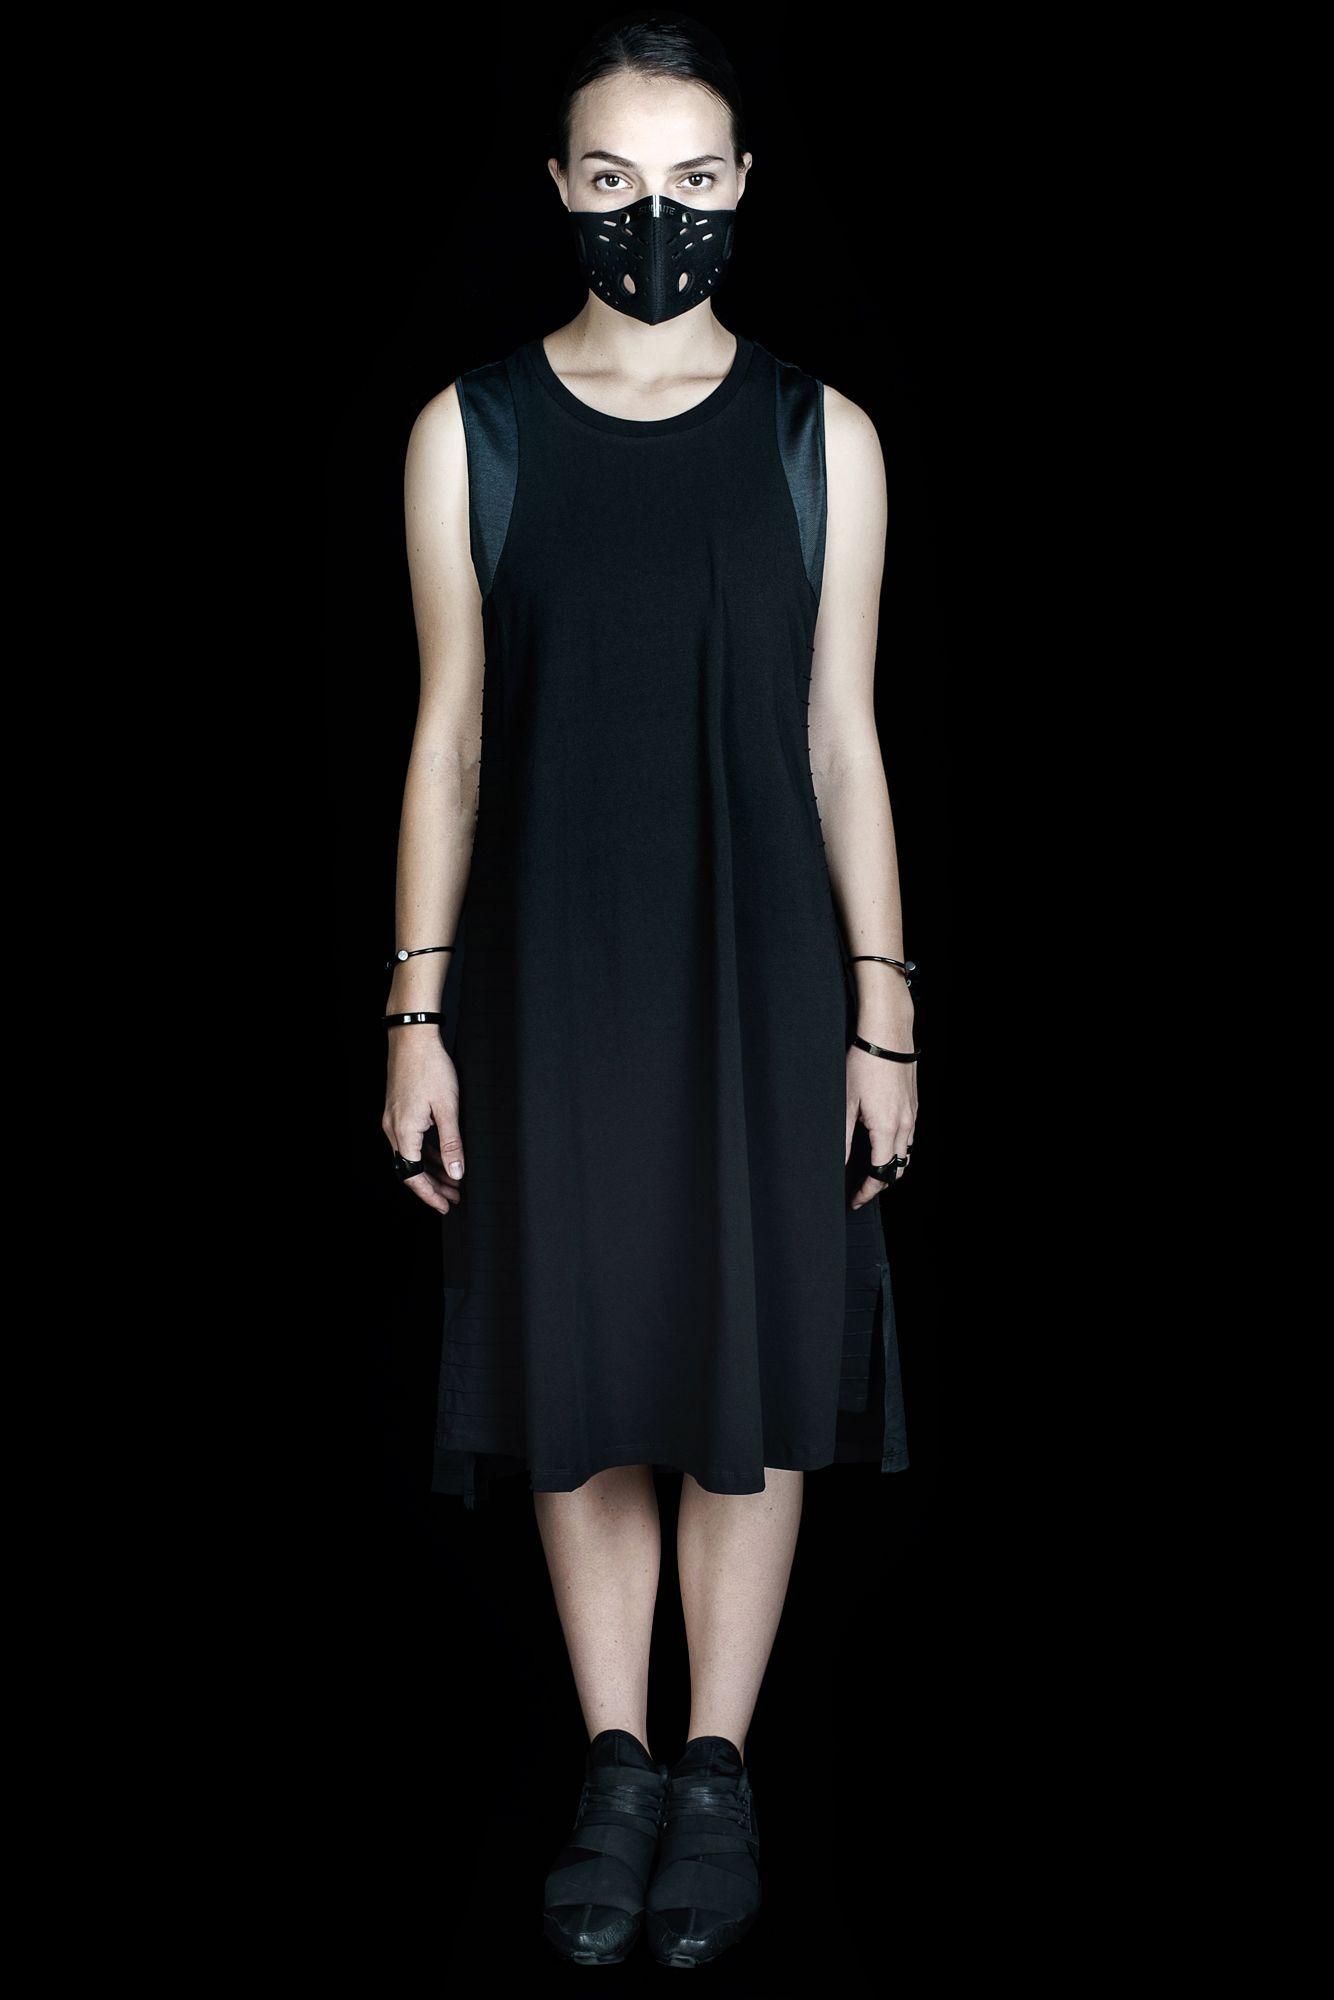 Unisexual clothing online